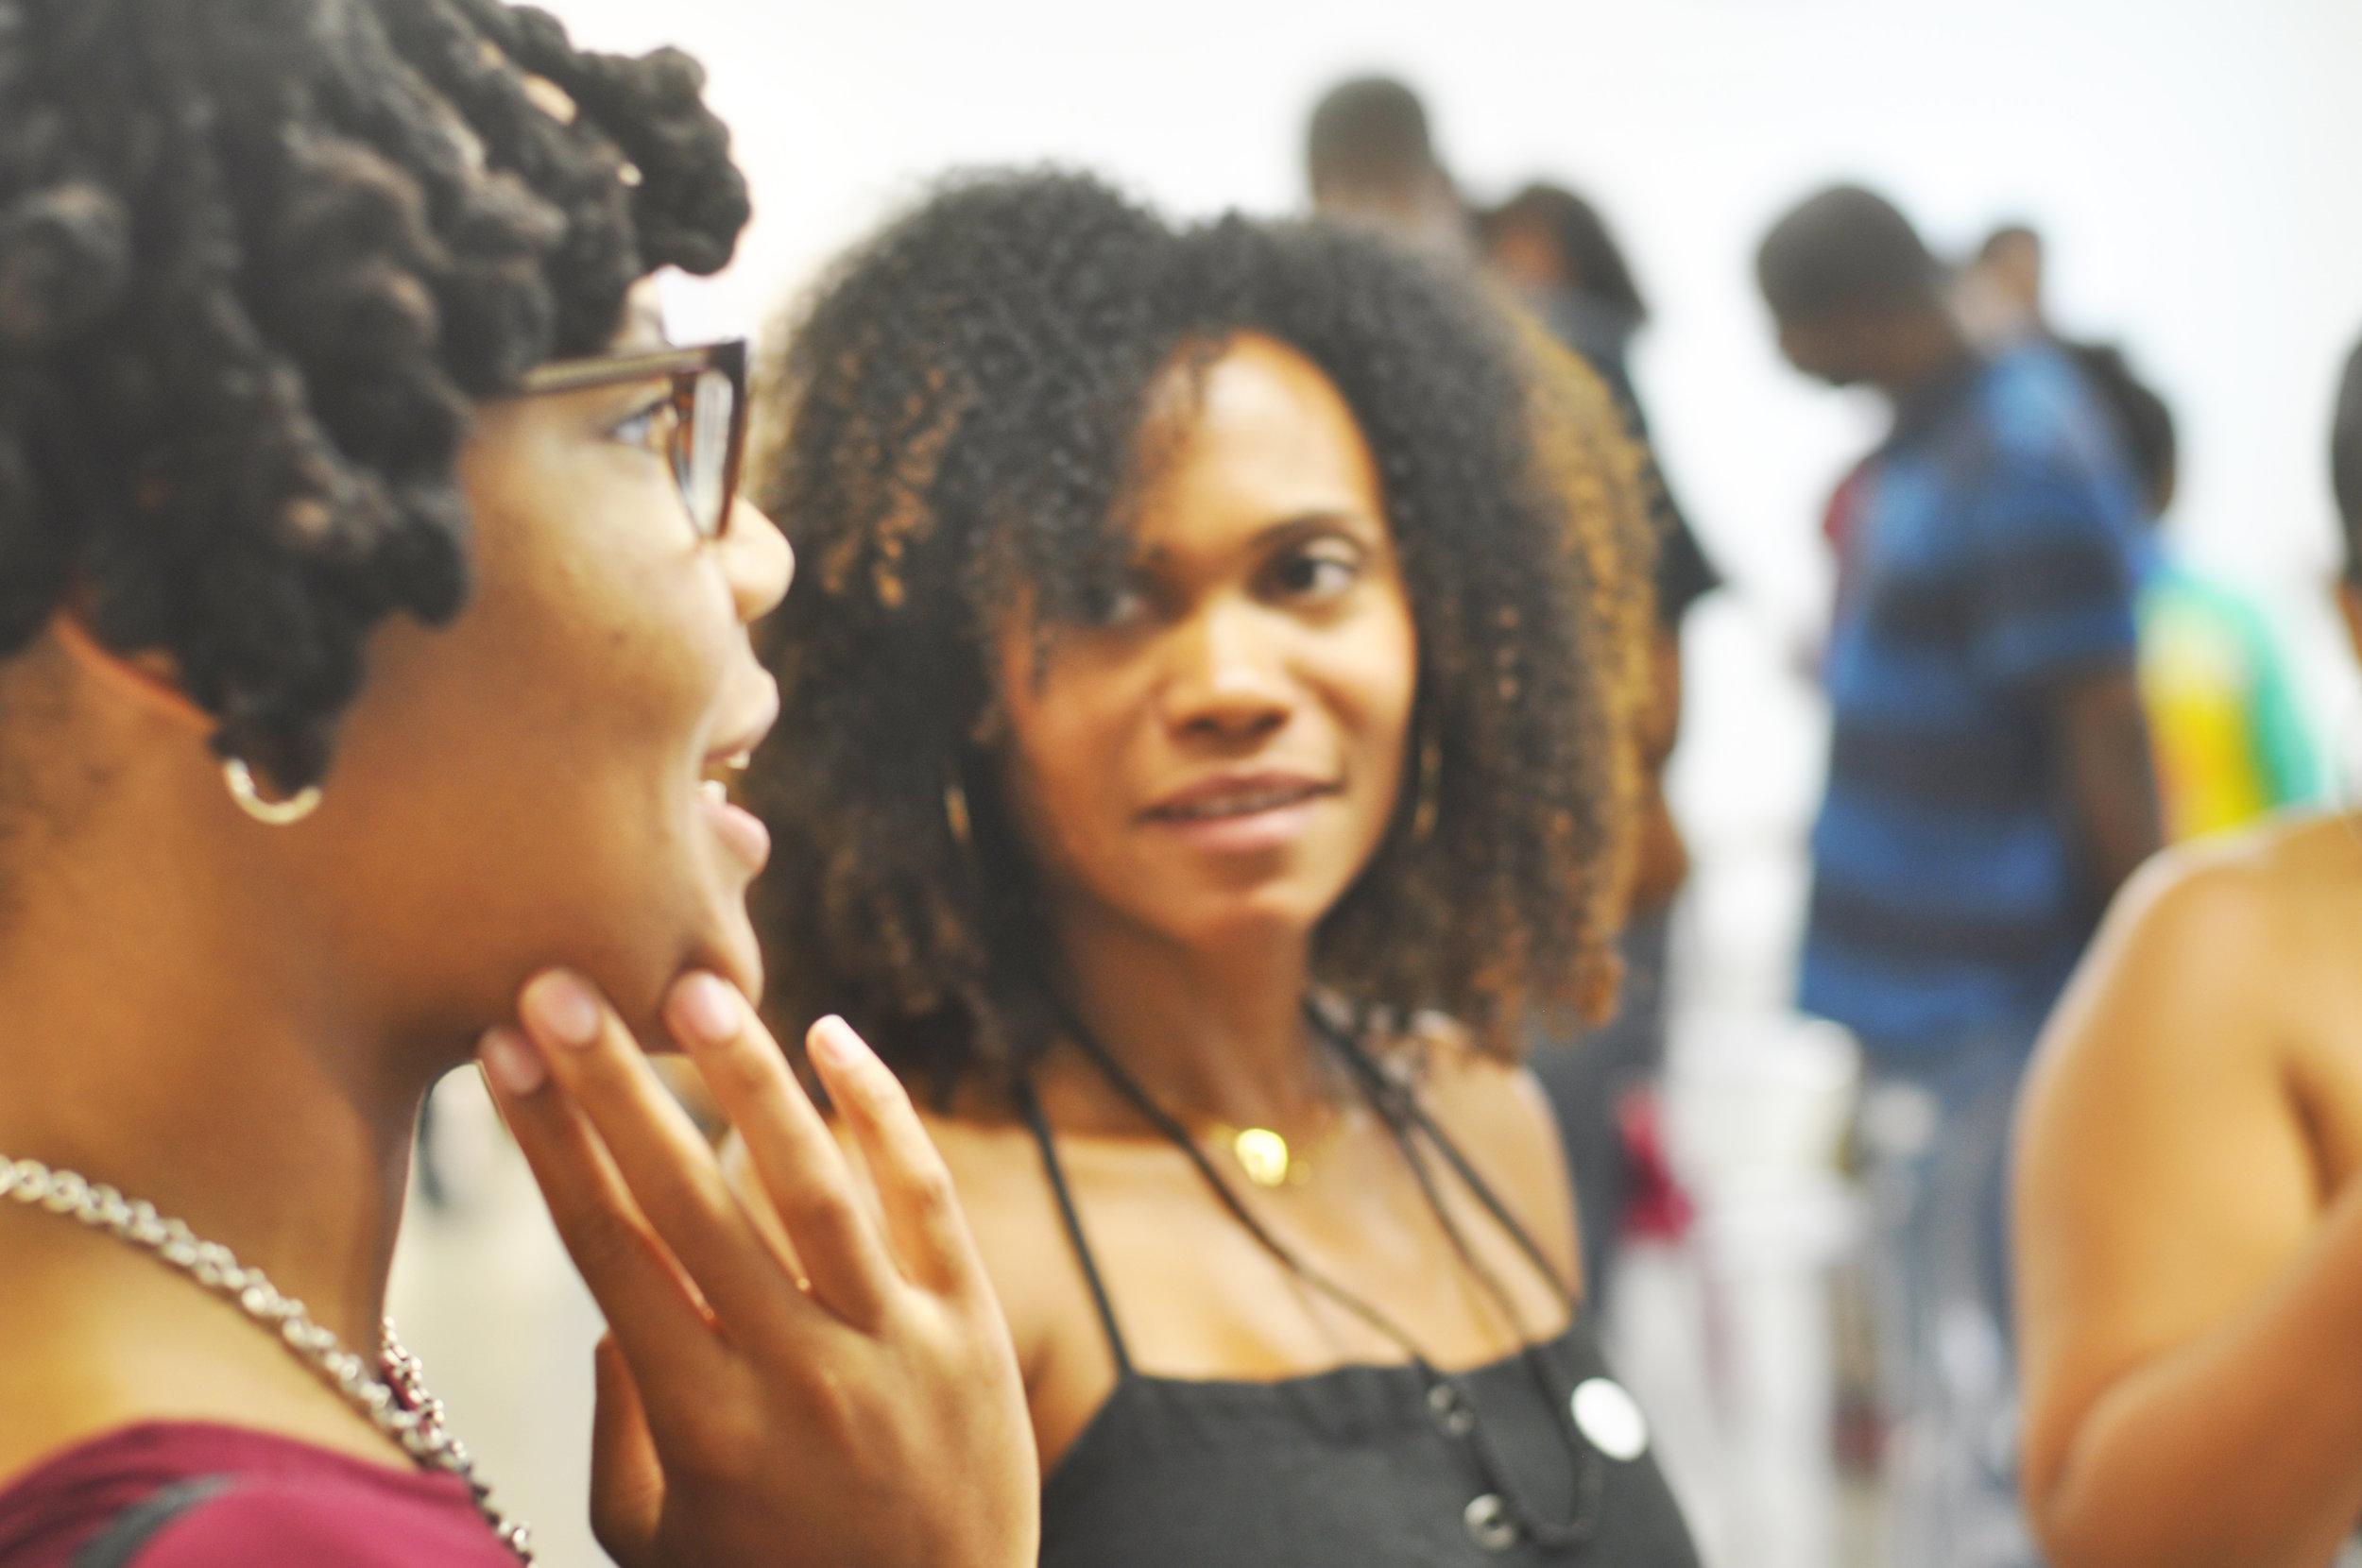 Lindsey Grant, Educator, & Karla Ferguson, Owner & Director - Yeelen Gallery Image by Stefan Grant